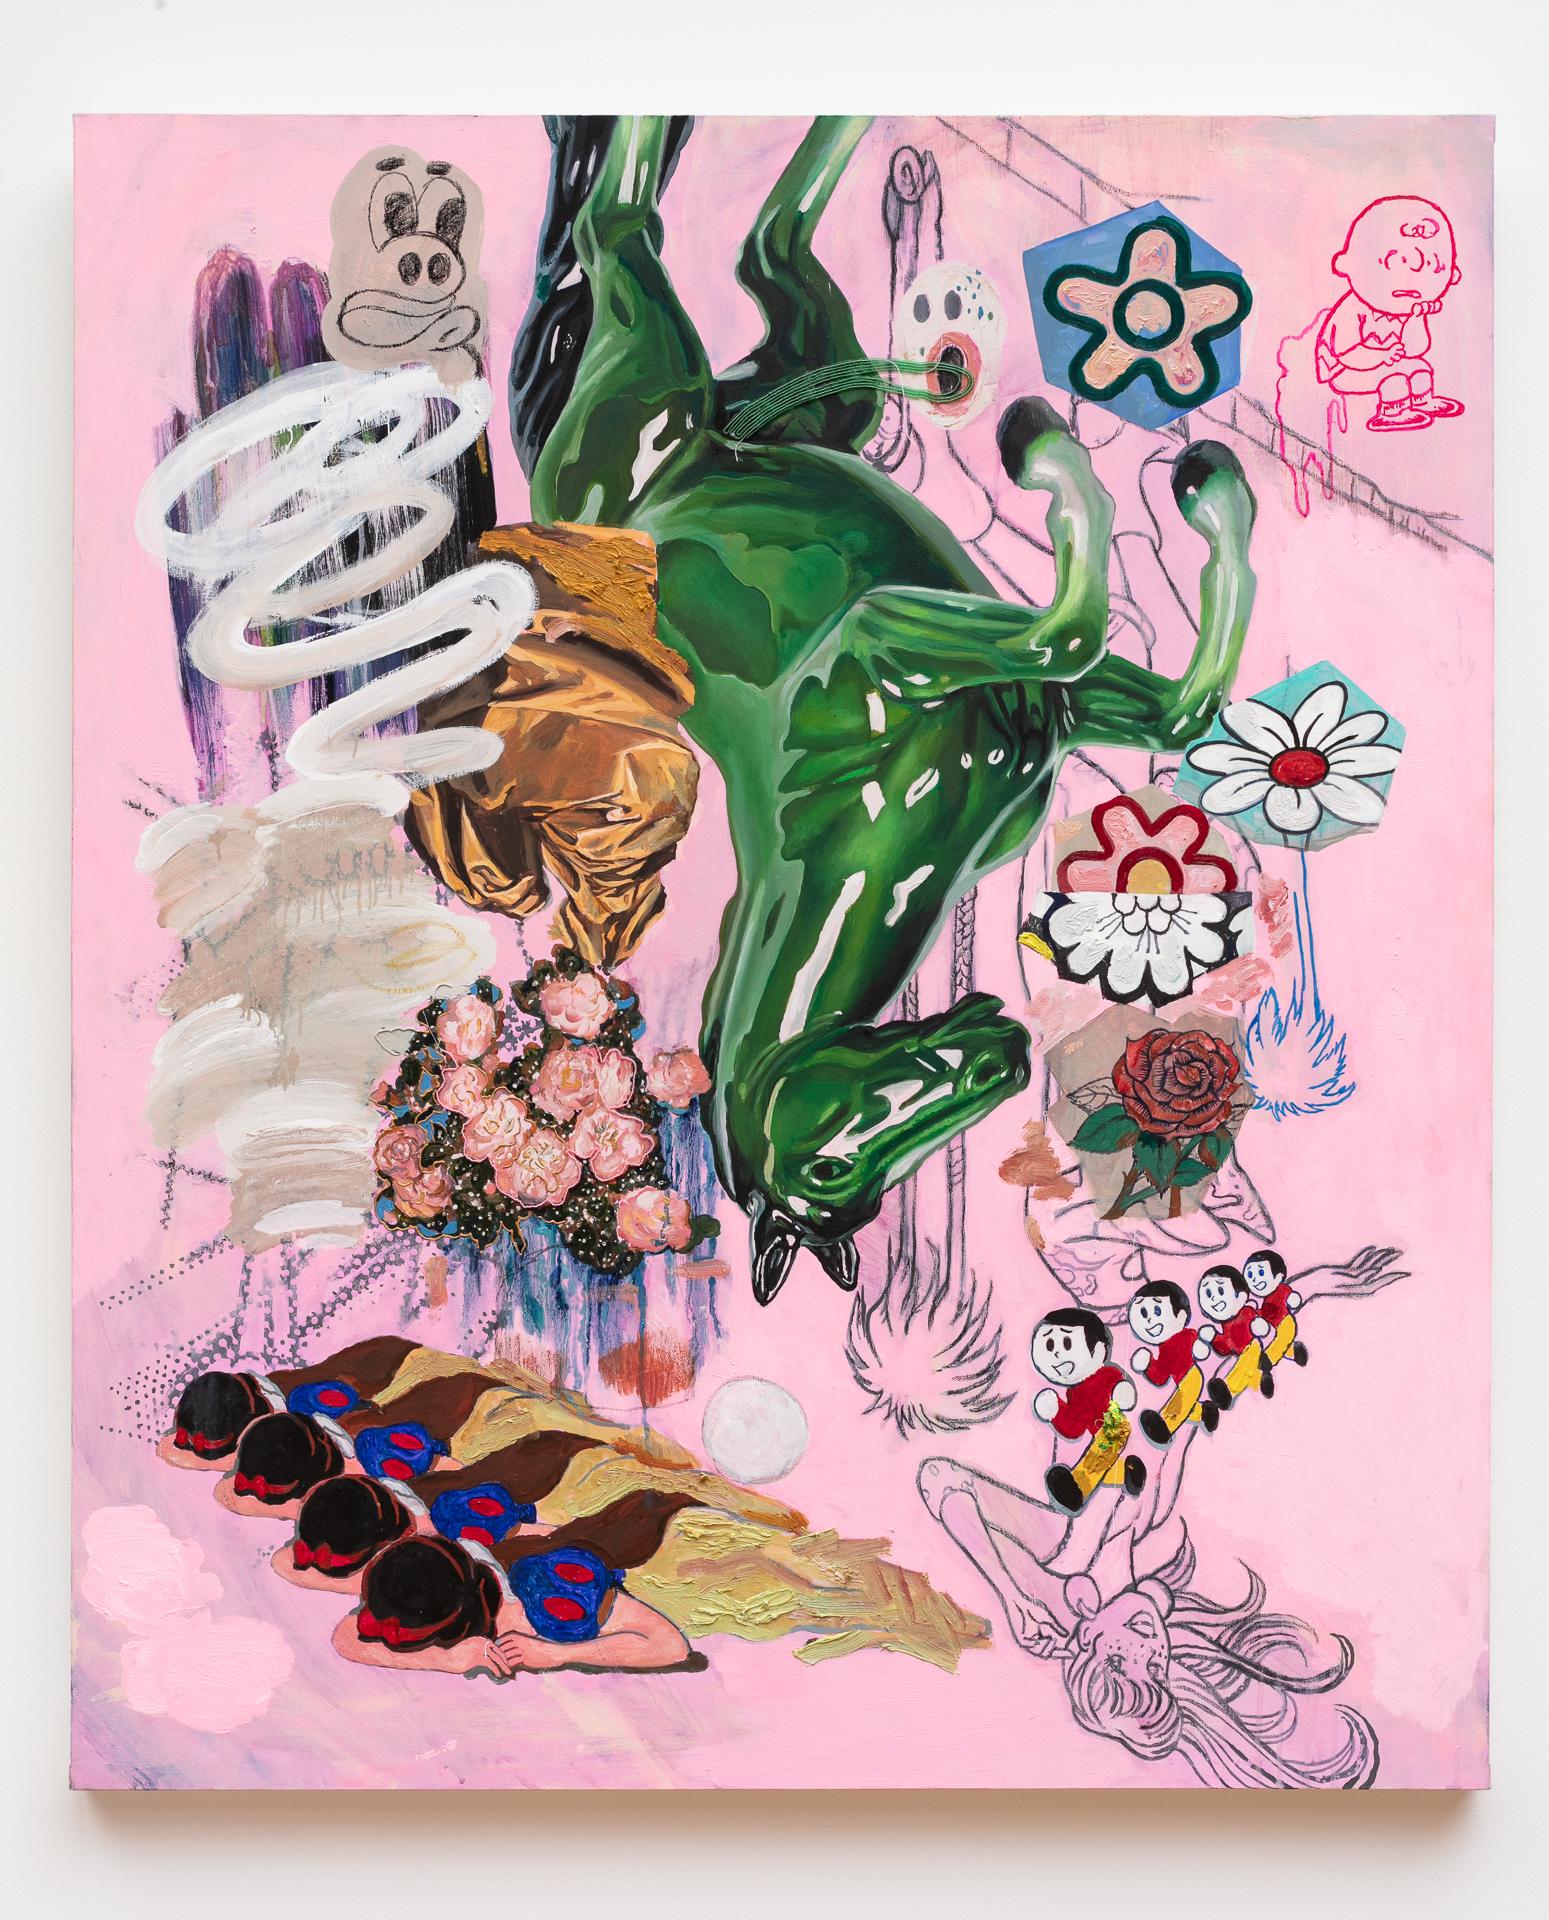 KContemporaryArt_Min_Green Horse (Charlie Brown and Snow White)_2019_Rabbit Glue, Oil paint, Korean Pigment, Glass Bead, Crystal on Raw Canvas_40x30_9000.jpg